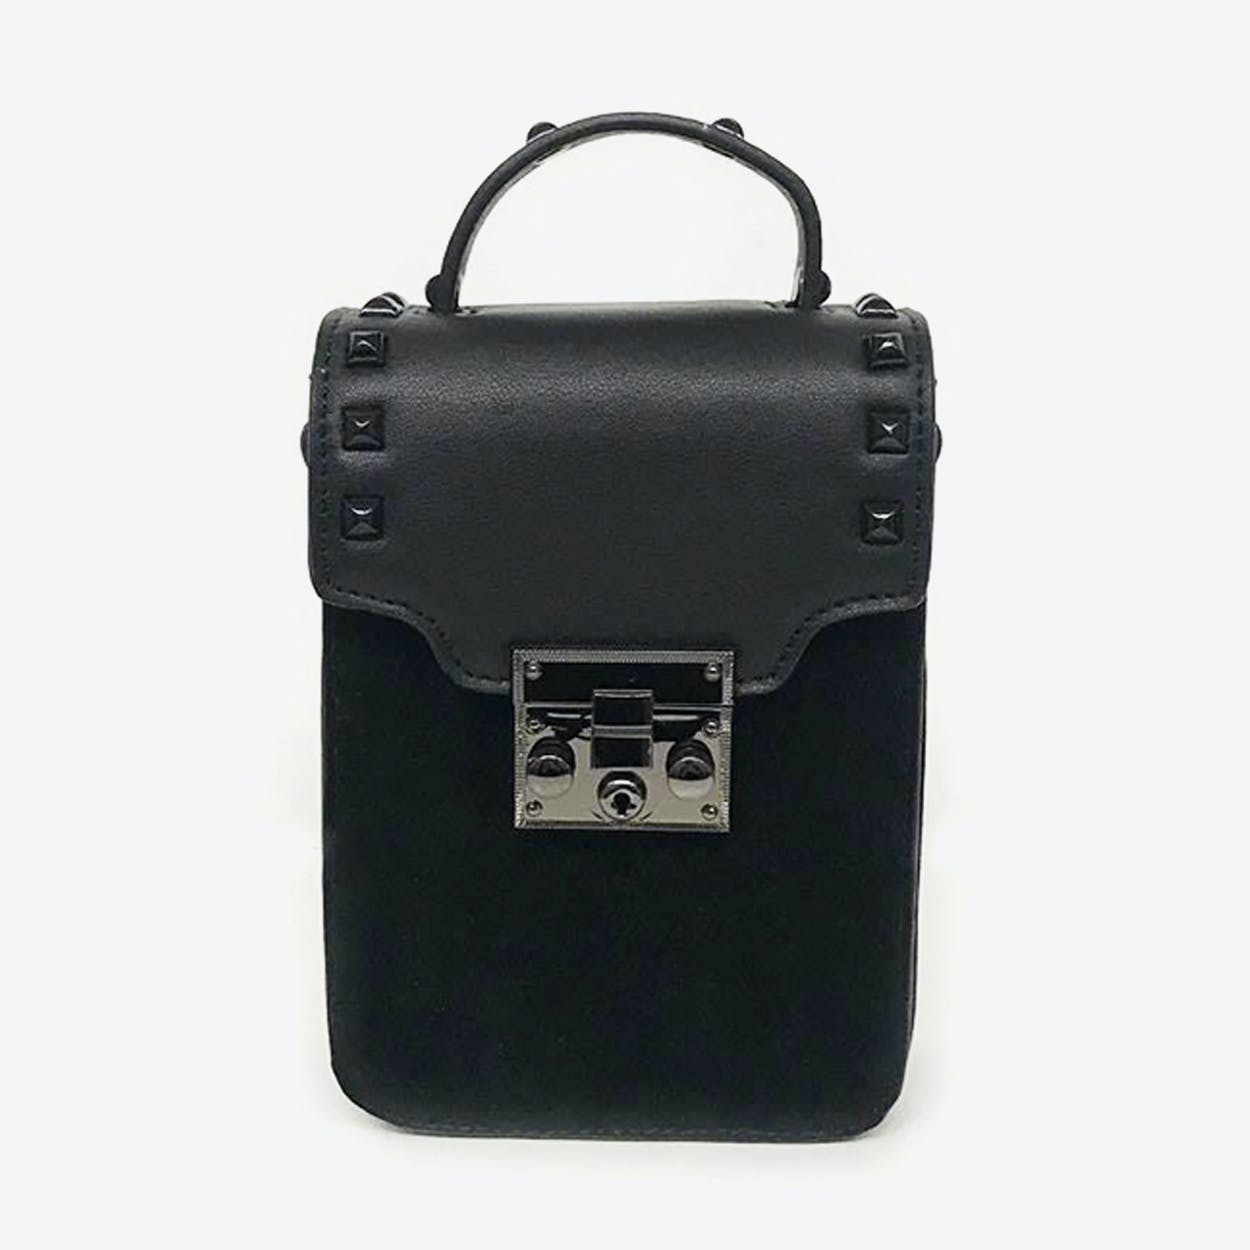 Antony Black 3.1 Crossbody Bag